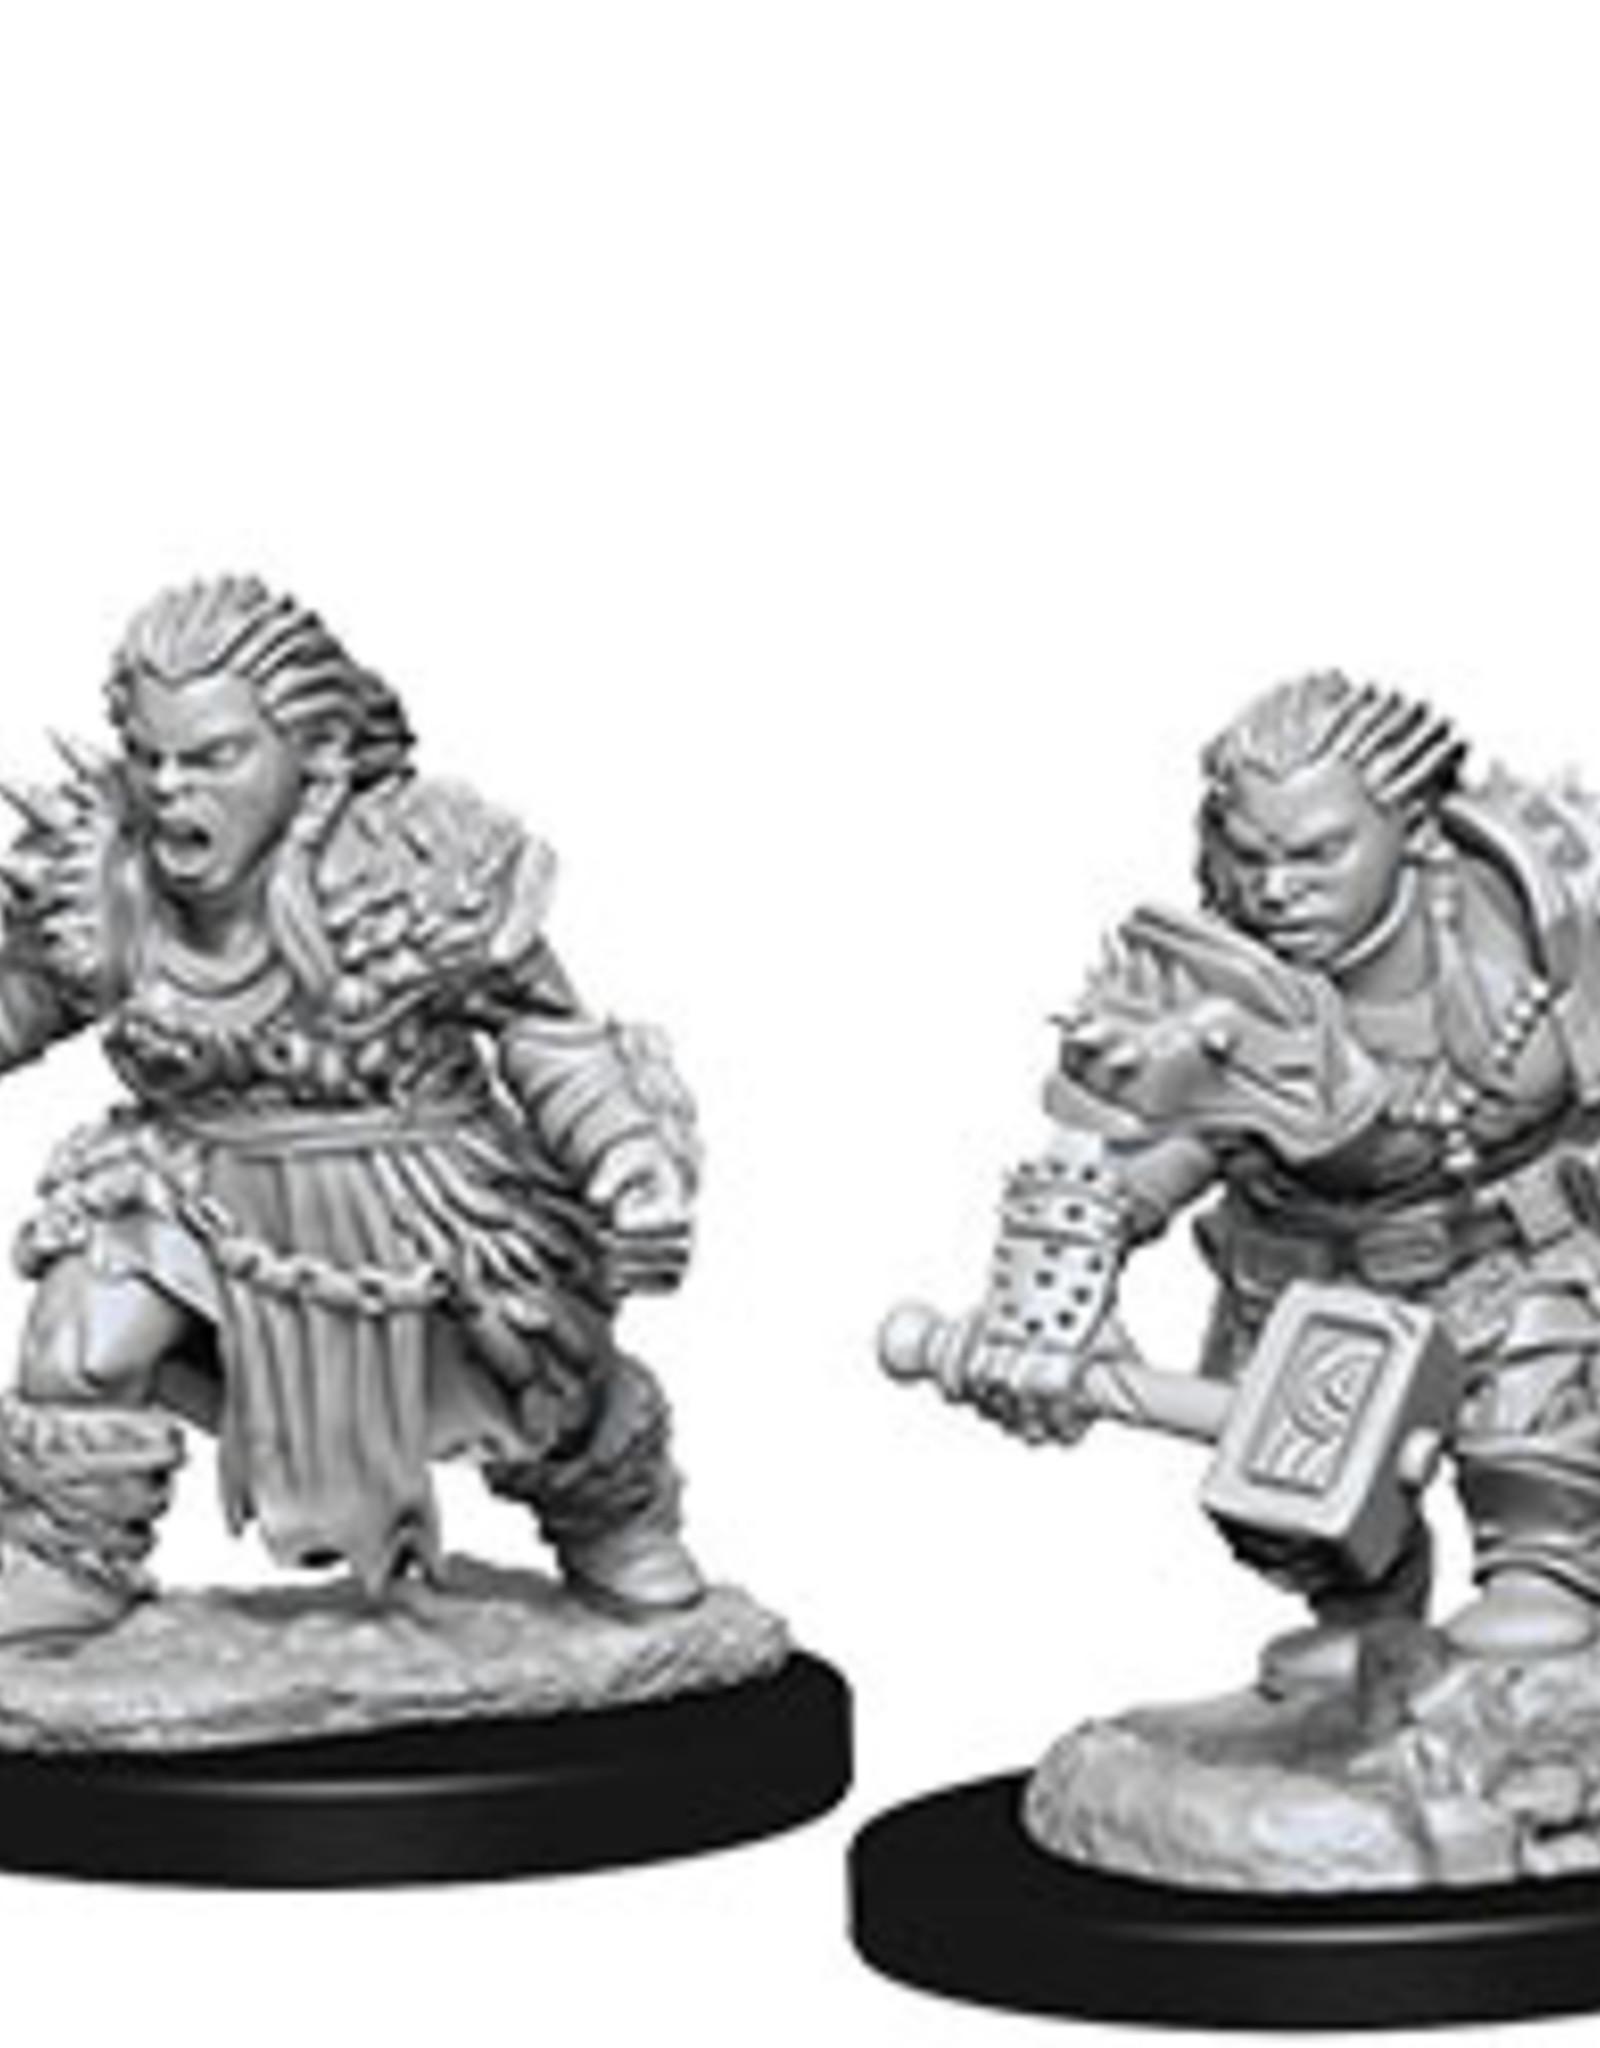 Pathfinder Deep Cuts Unpainted Miniatures: W8 Dwarf Female Barbarian